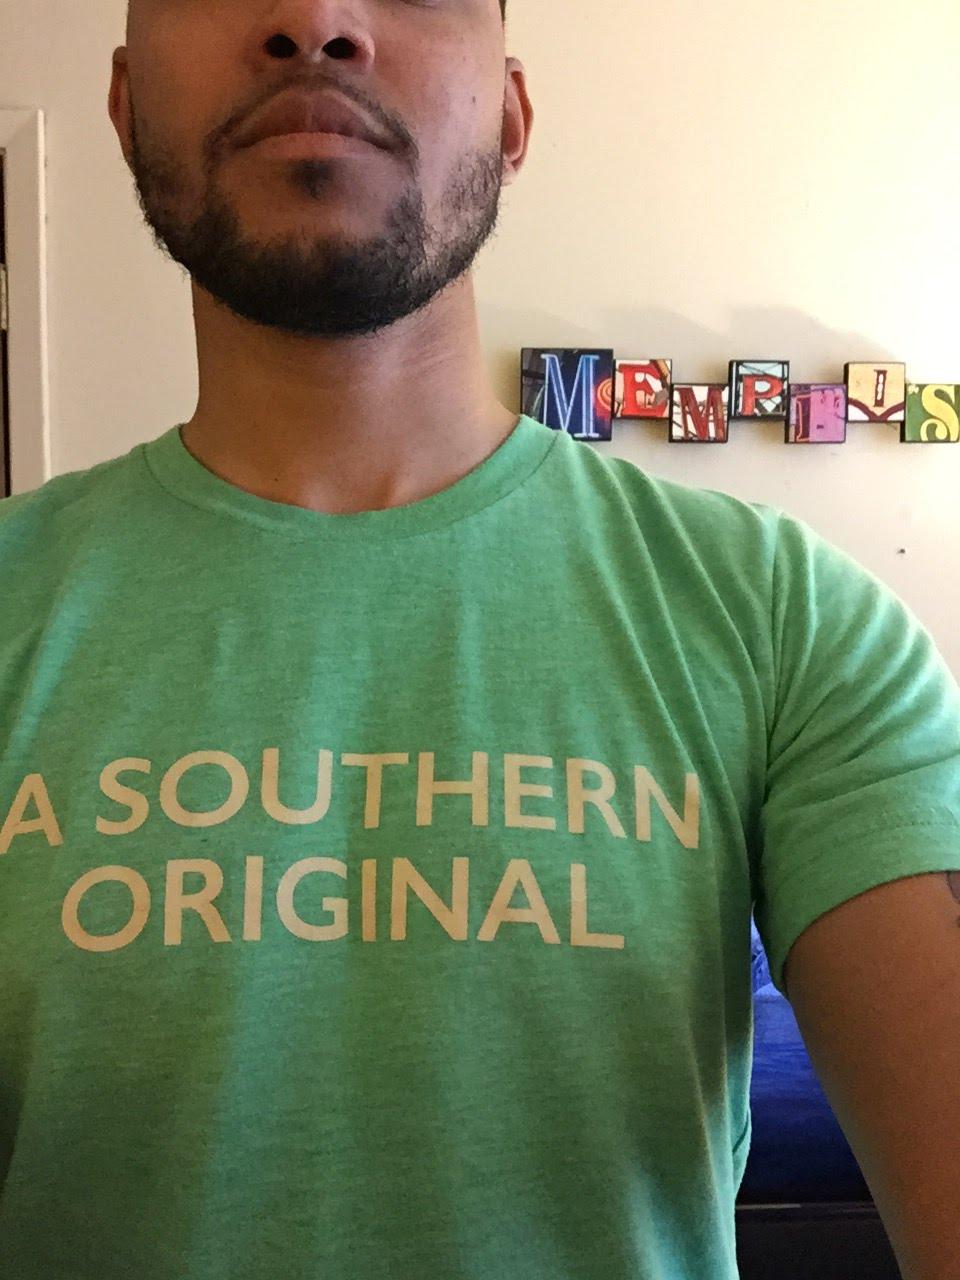 A Southern Original